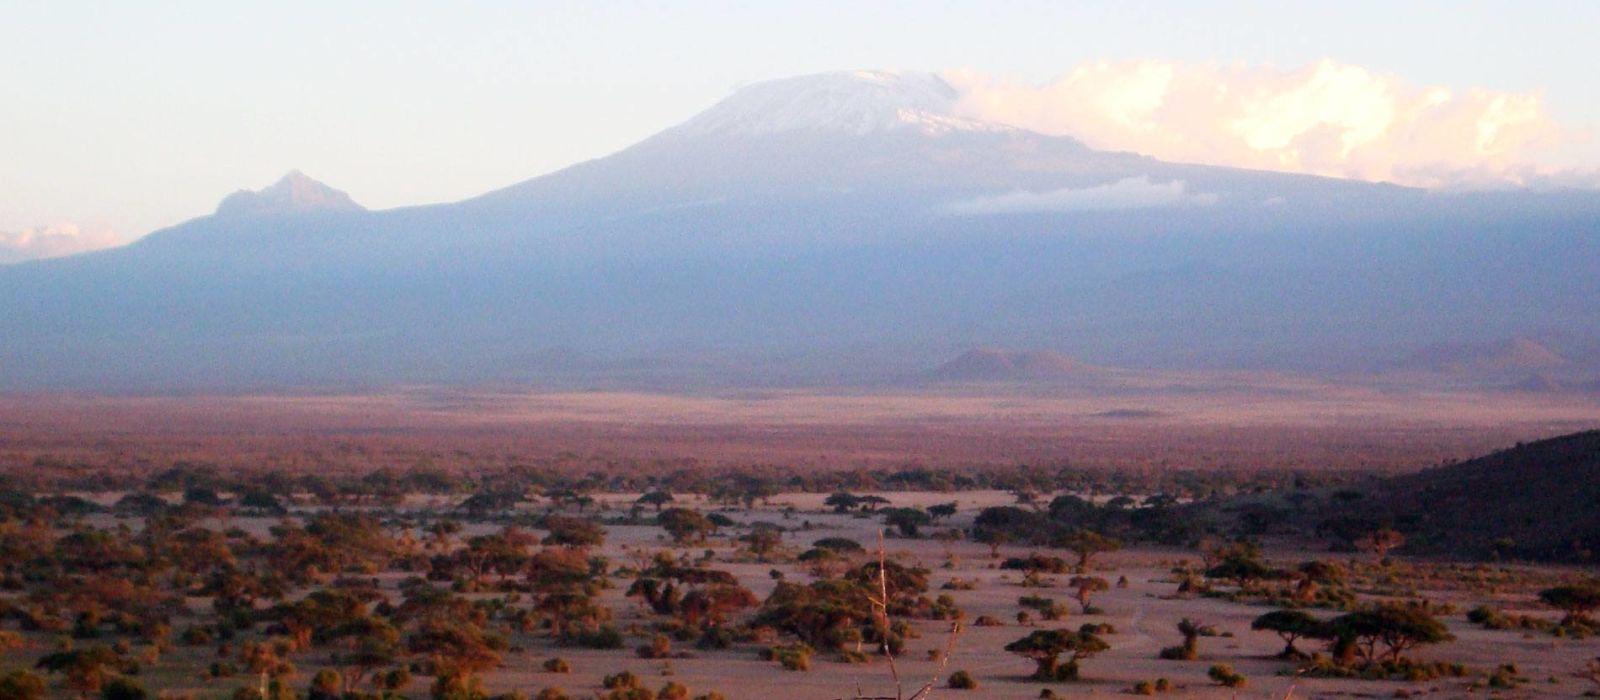 Destination Amboseli Kenya